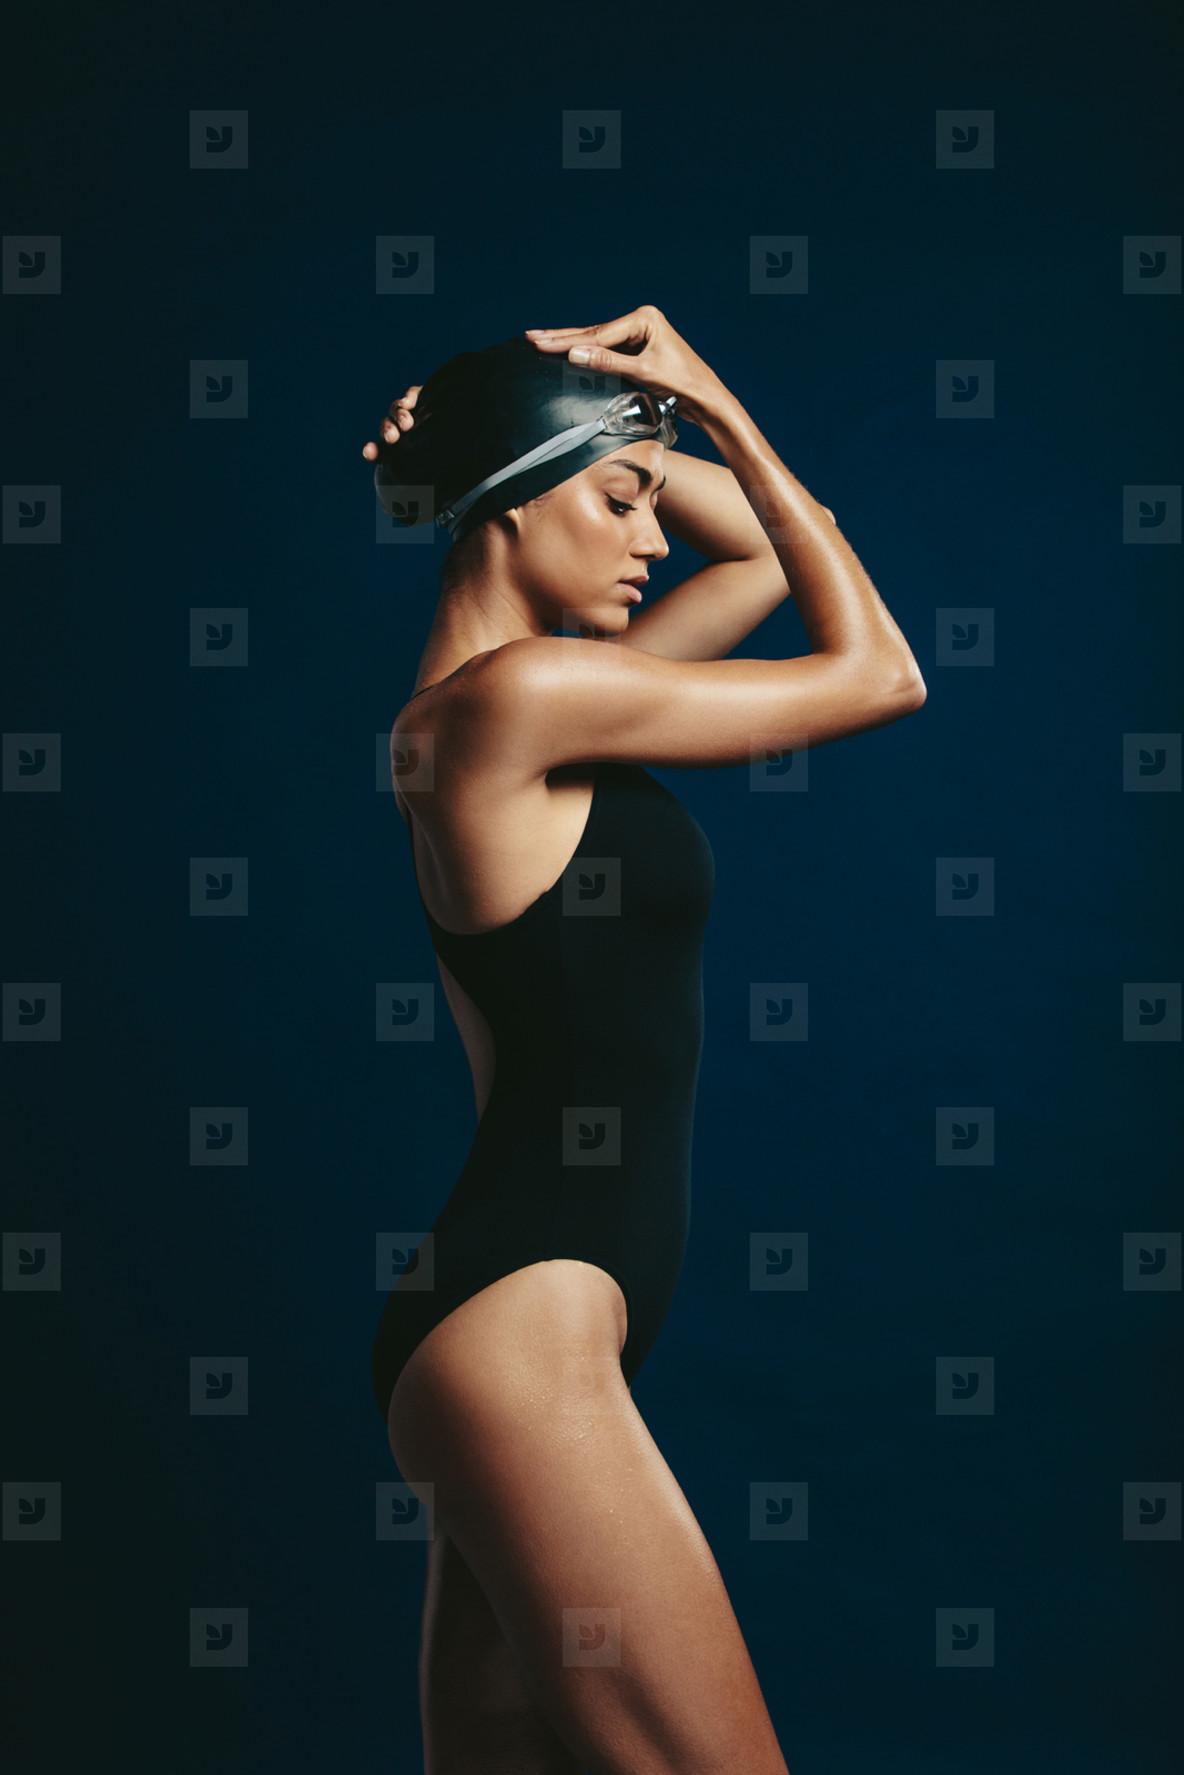 Fitness model in swimming costume